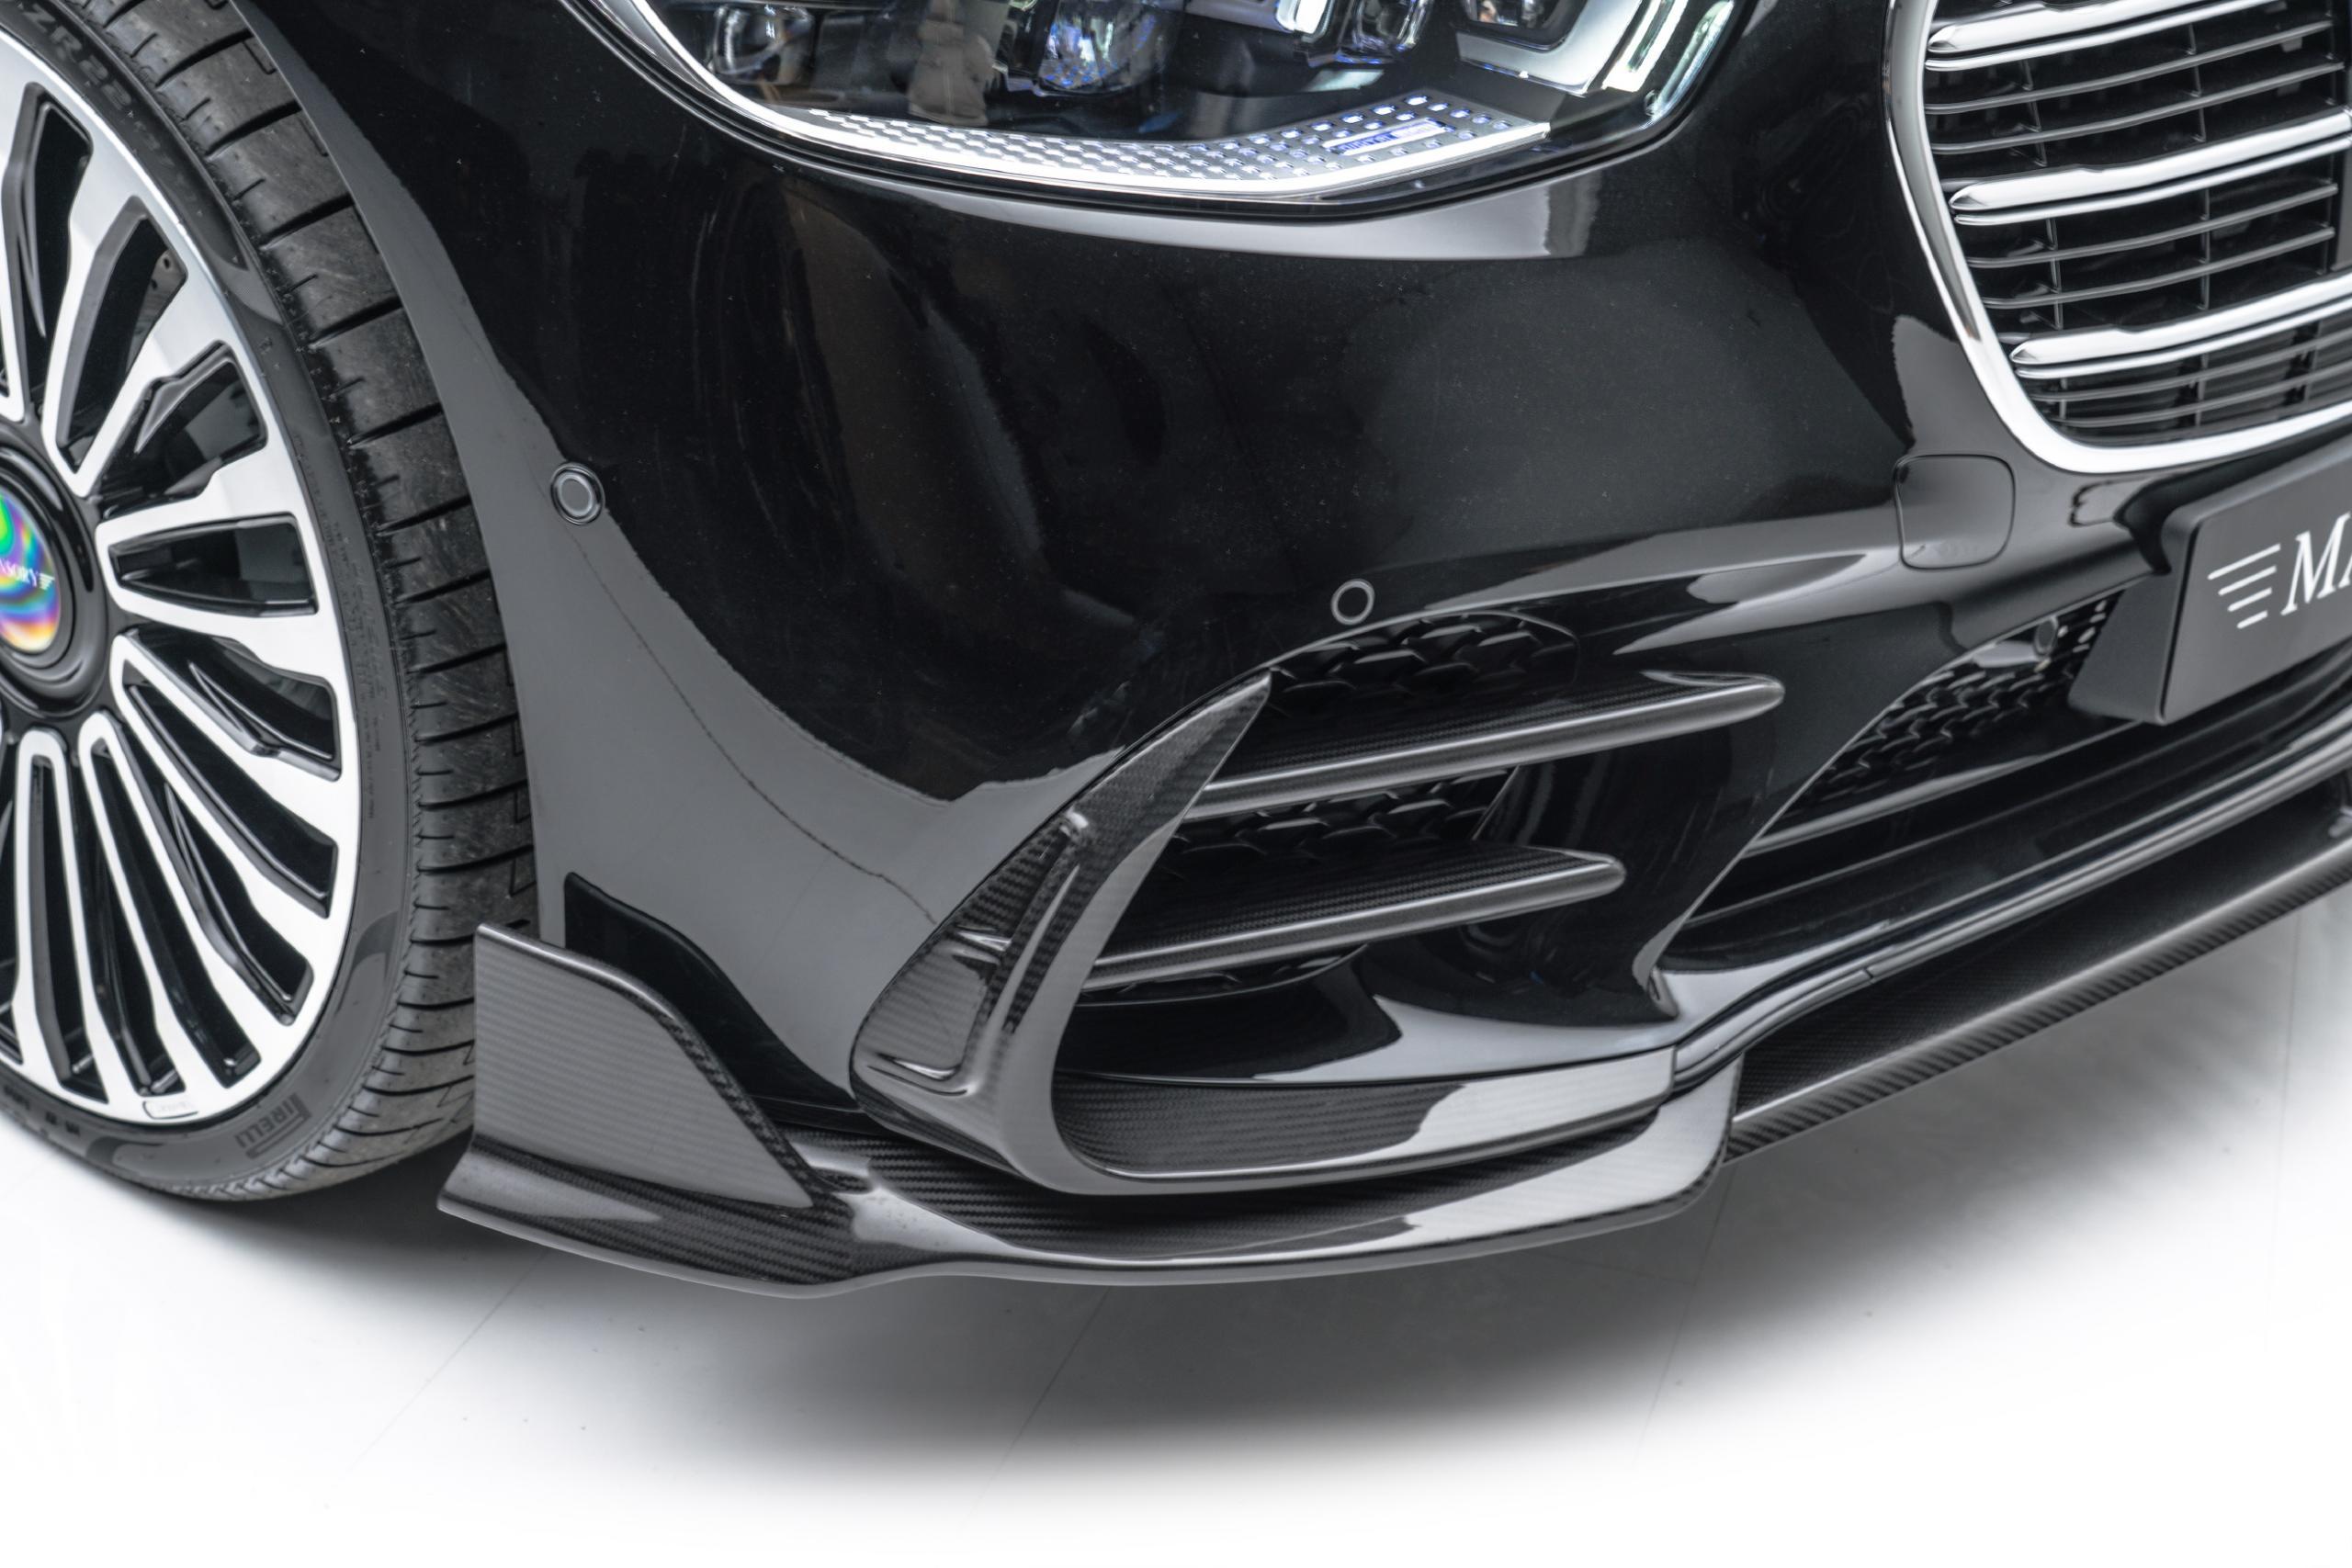 mansory w223 mercedes s class body kit carbon fiber front bumper air intake 2021 2022 2023